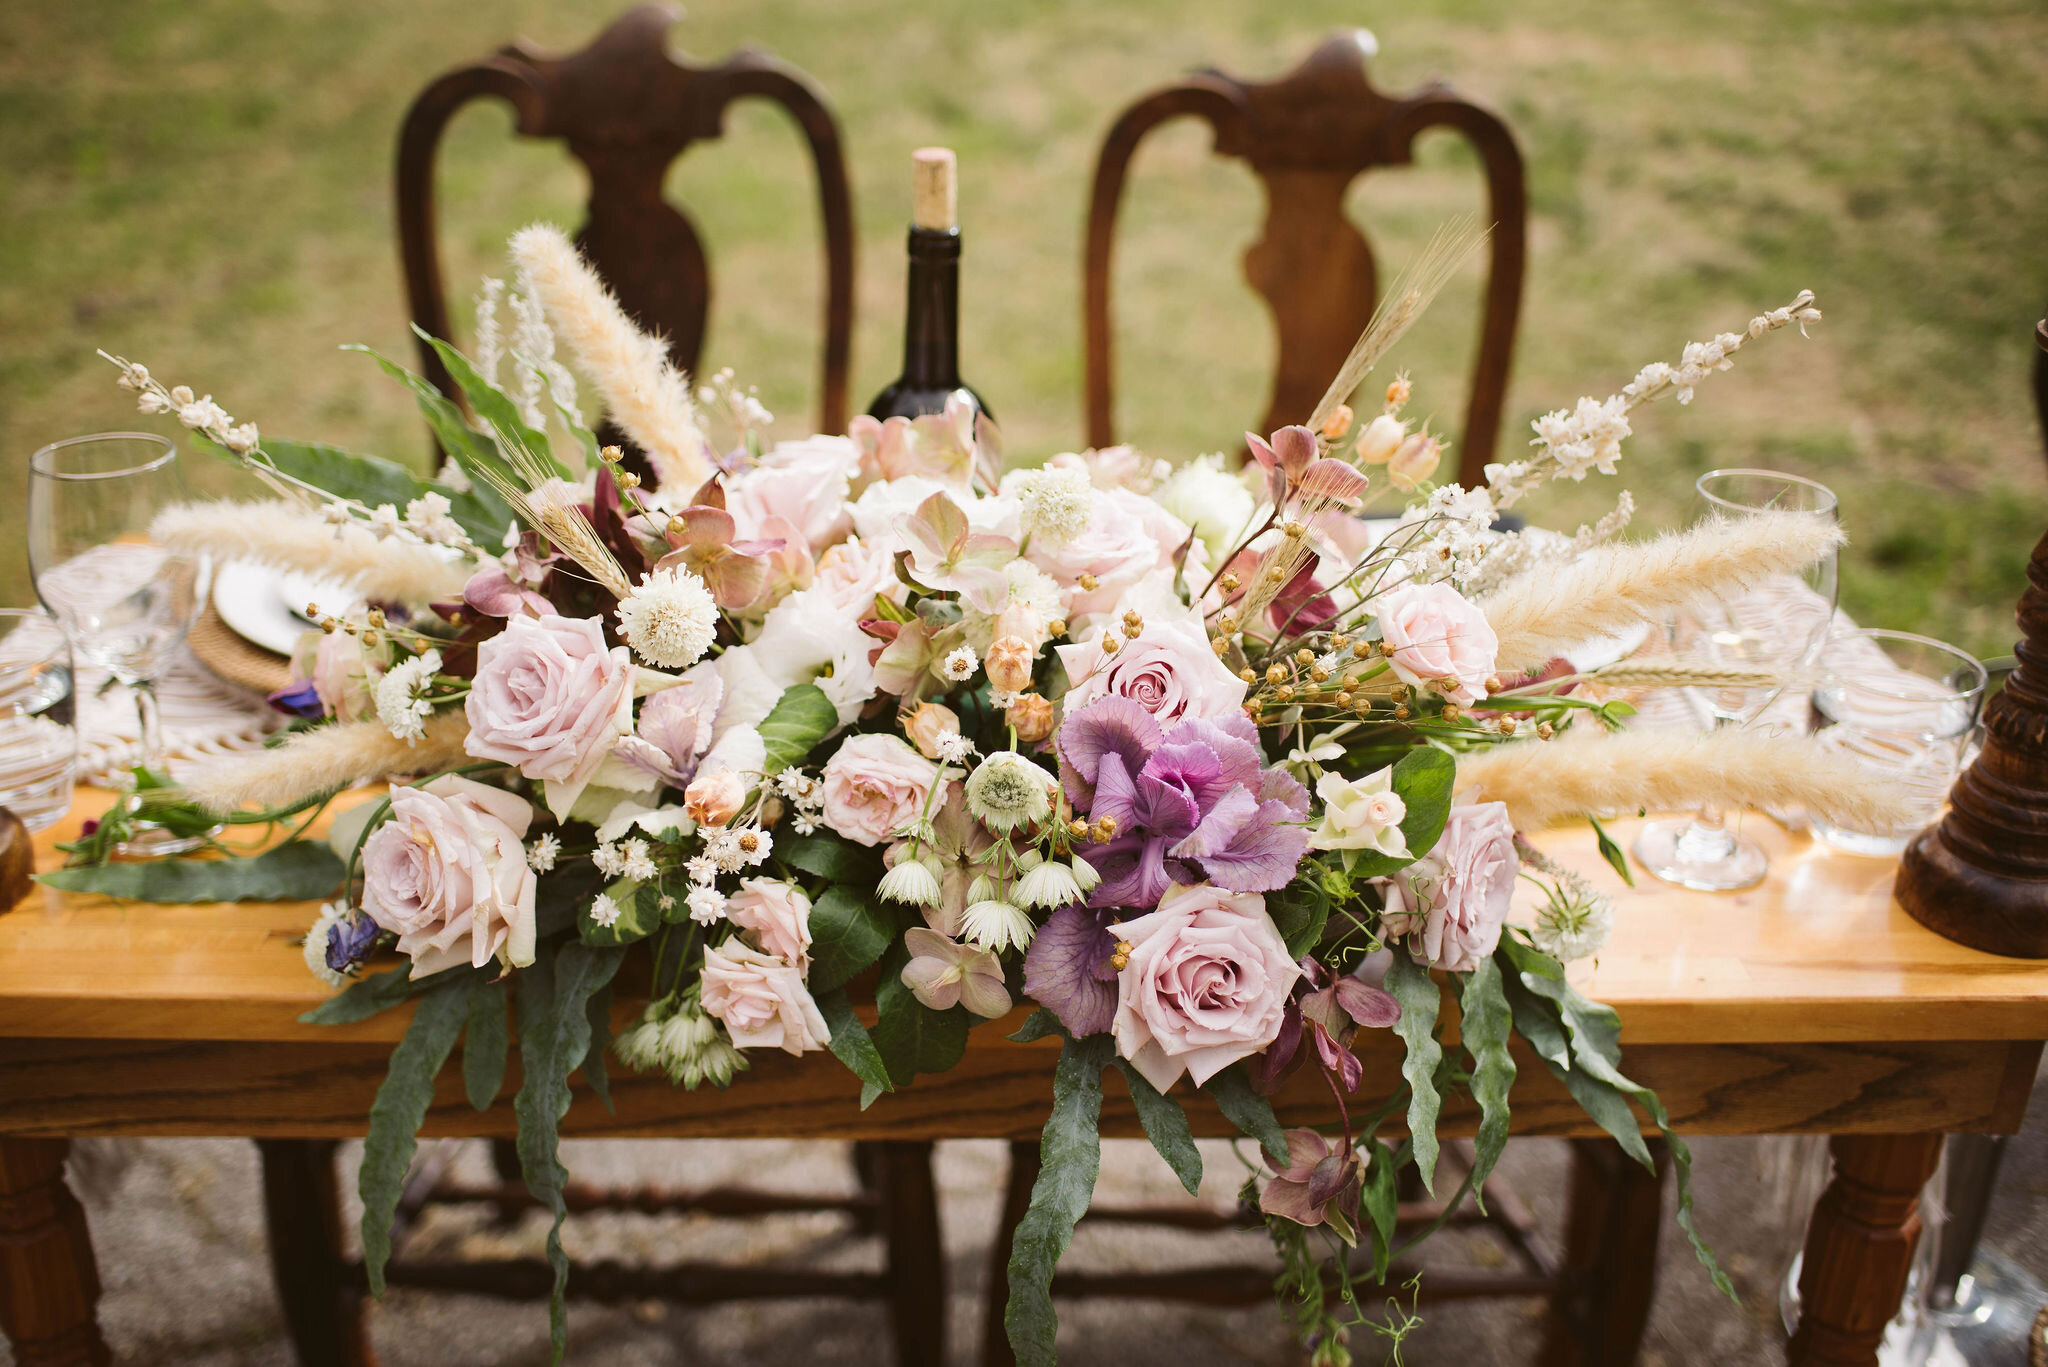 Venture-Retreat-Center-Wedding-Pescadero-Sat-Aaron-Pritam-The-Shalom-Imaginative-515.jpg